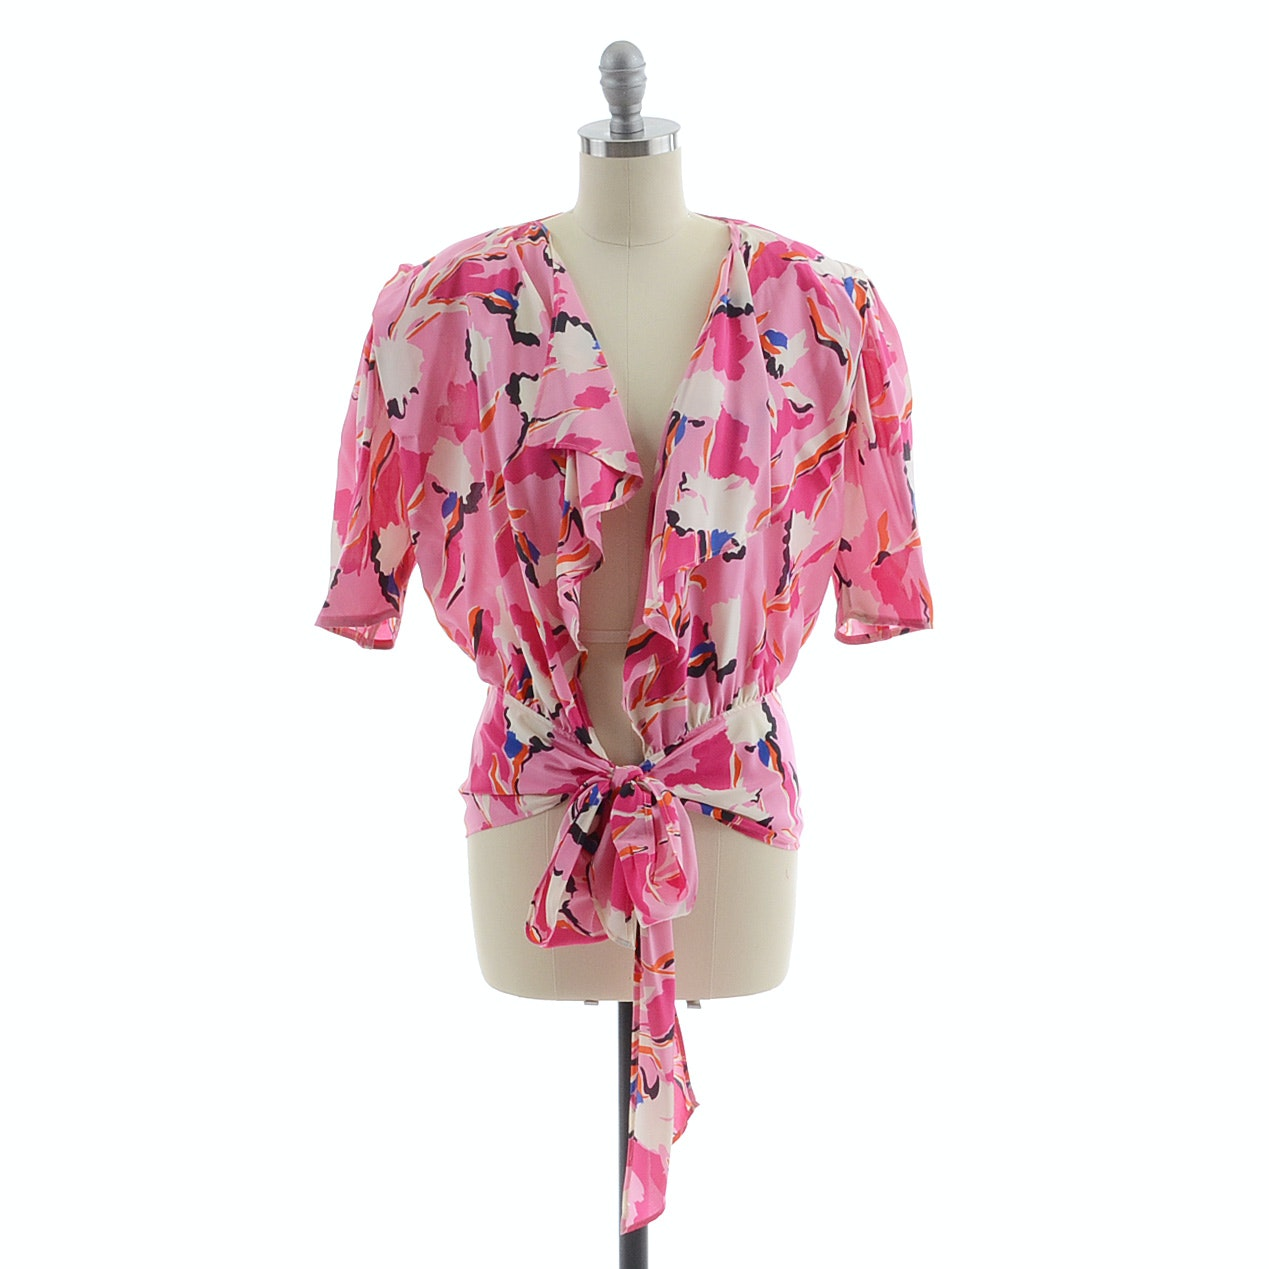 1980s Emanuel Ungaro of Paris Solo Donna Bold Multi-Color Floral Silk Print Open Front Blouse with Tie Bow